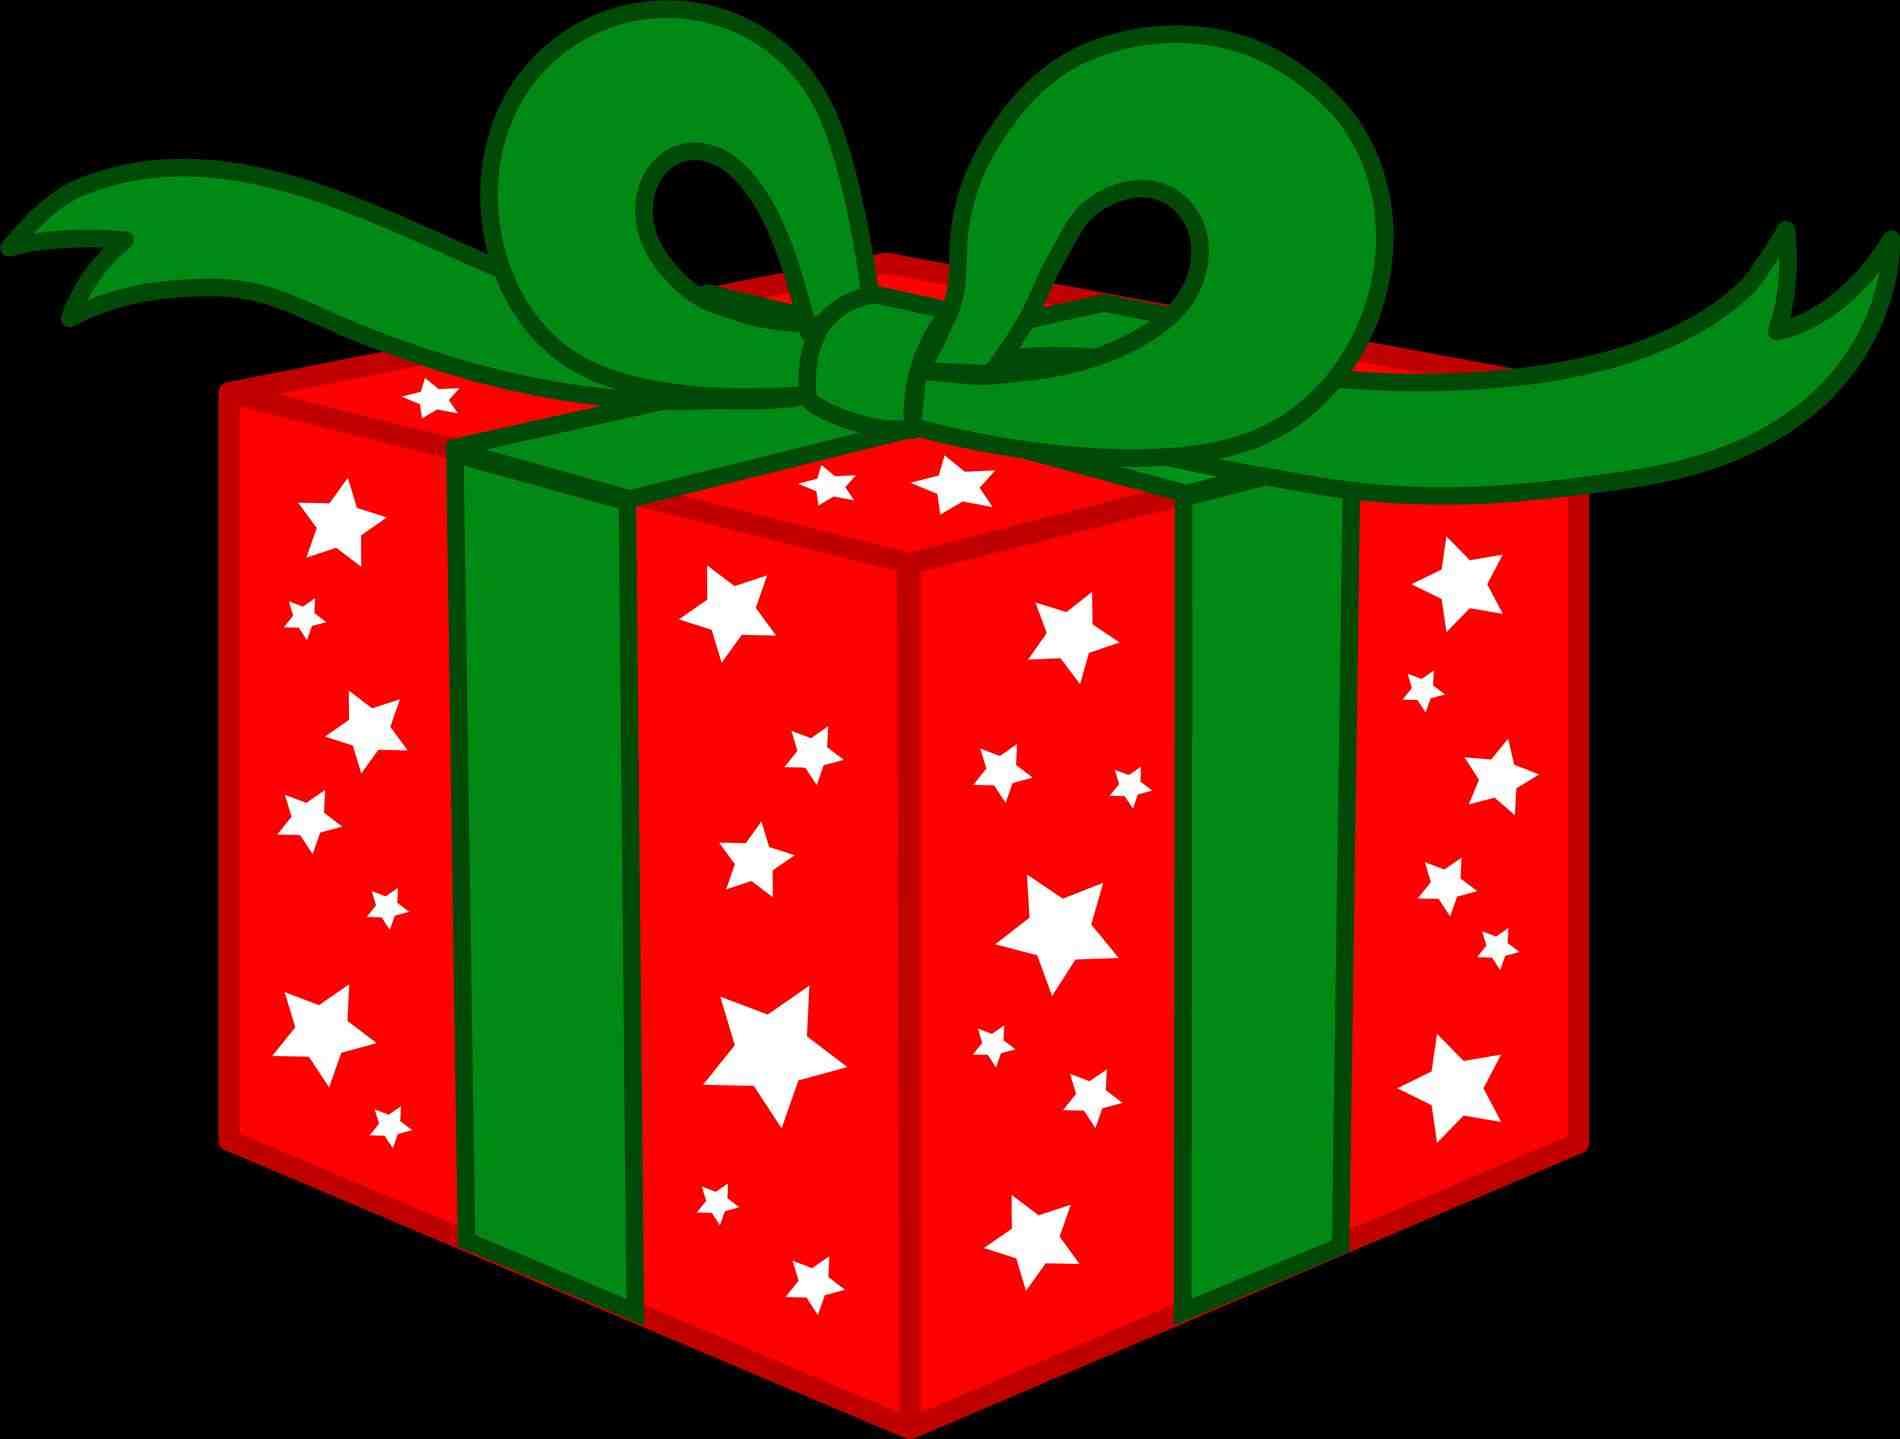 1900x1439 Celebration Humorous Coon Vector Stock Celebration Christmas Party